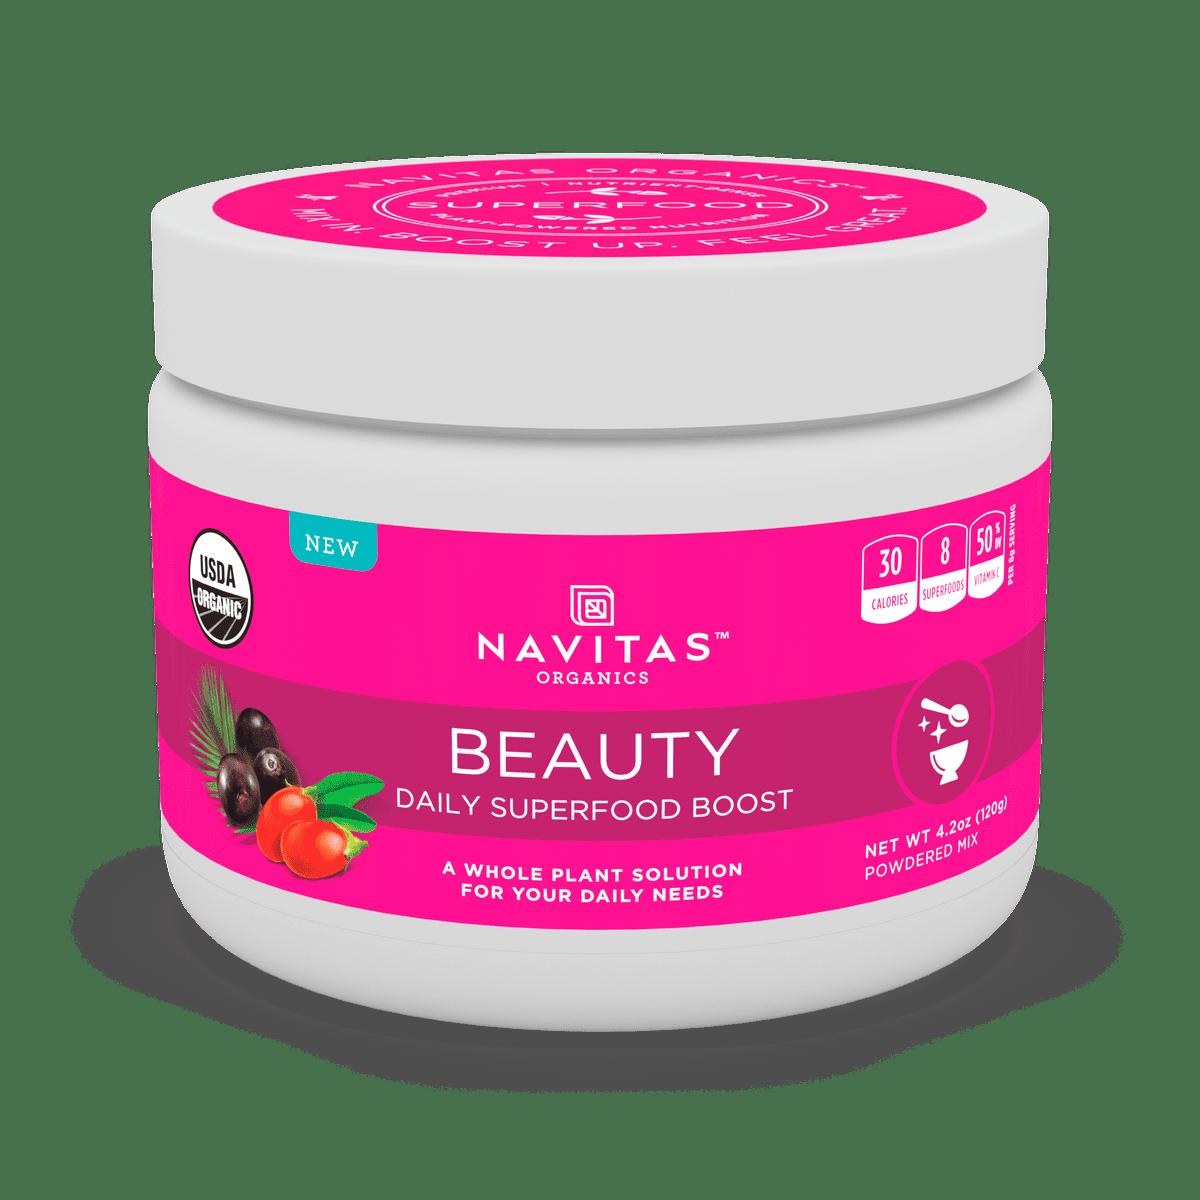 Navitas Organics Daily Beauty Superfood Powder, 4.2 Oz, 15 Servings